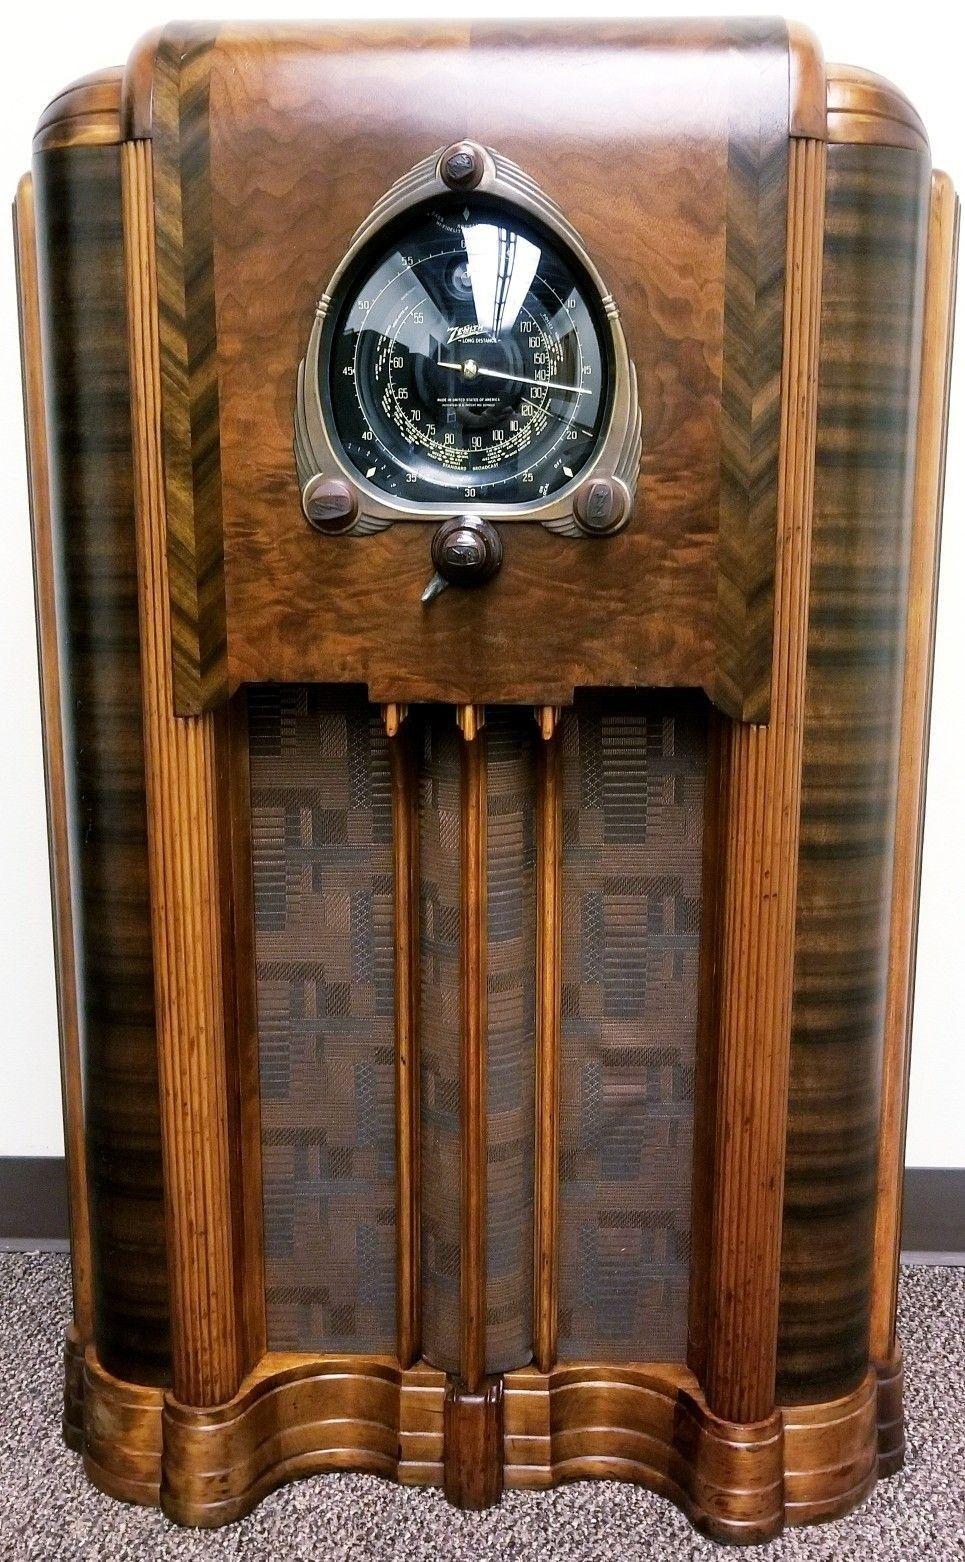 Pin By Fernando Kummel On Tube Amps And Other Audio Awesomeness Vintage Radio Antique Radio Retro Radios